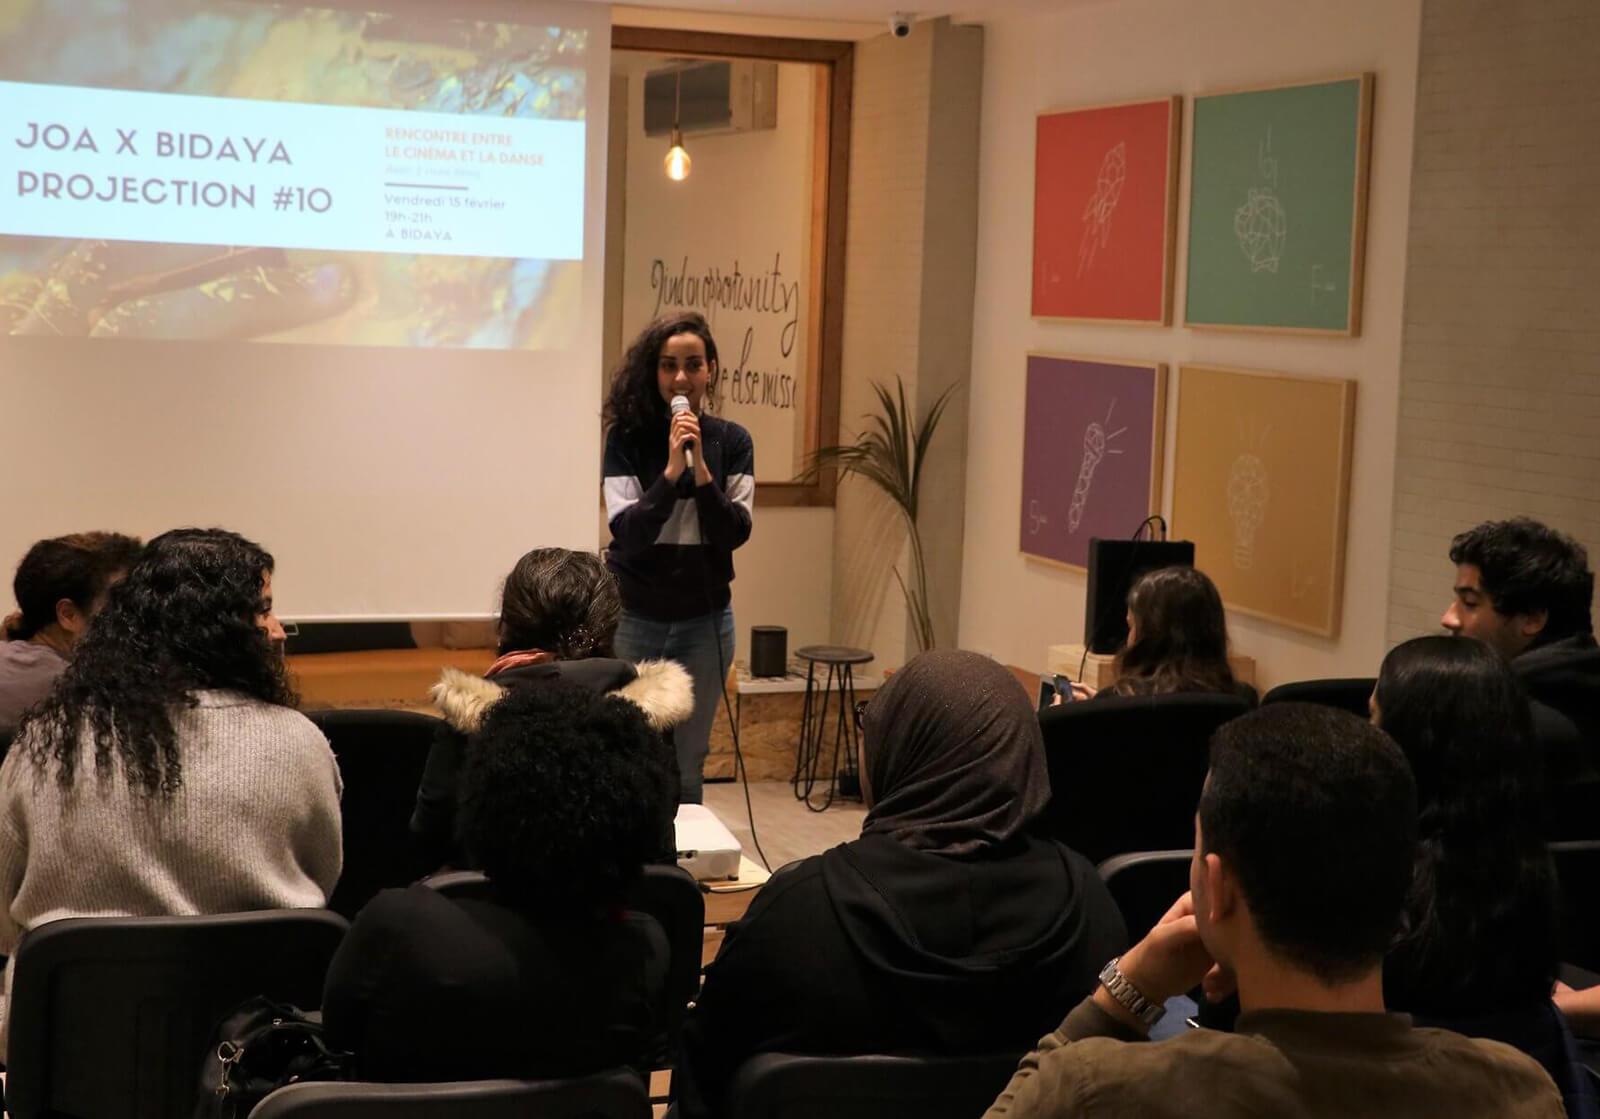 Joy Of Arts et Bidaya co-organisent une projection